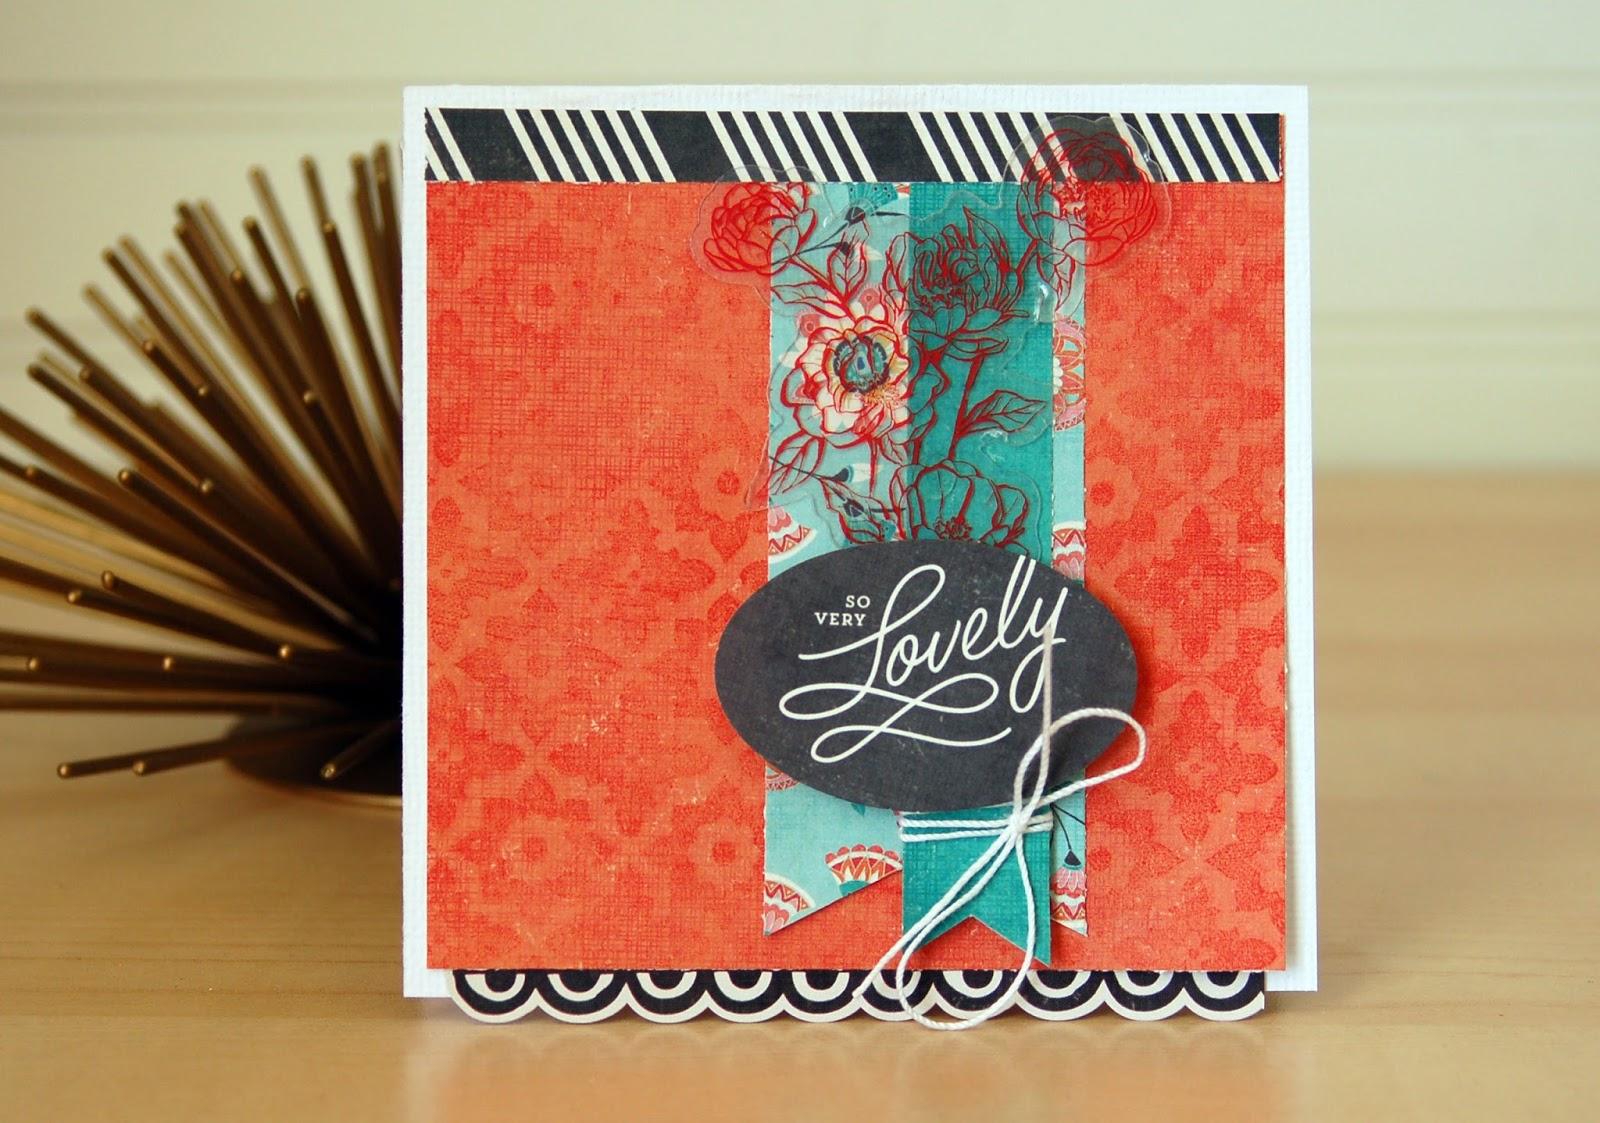 http://2.bp.blogspot.com/-N8Yjbma81-U/U2t_PUb-N3I/AAAAAAAASKM/ery6LNFyQSk/s1600/Basic-Grey-Spice-Market-Card-2-by-Jen-Gallacher.jpg